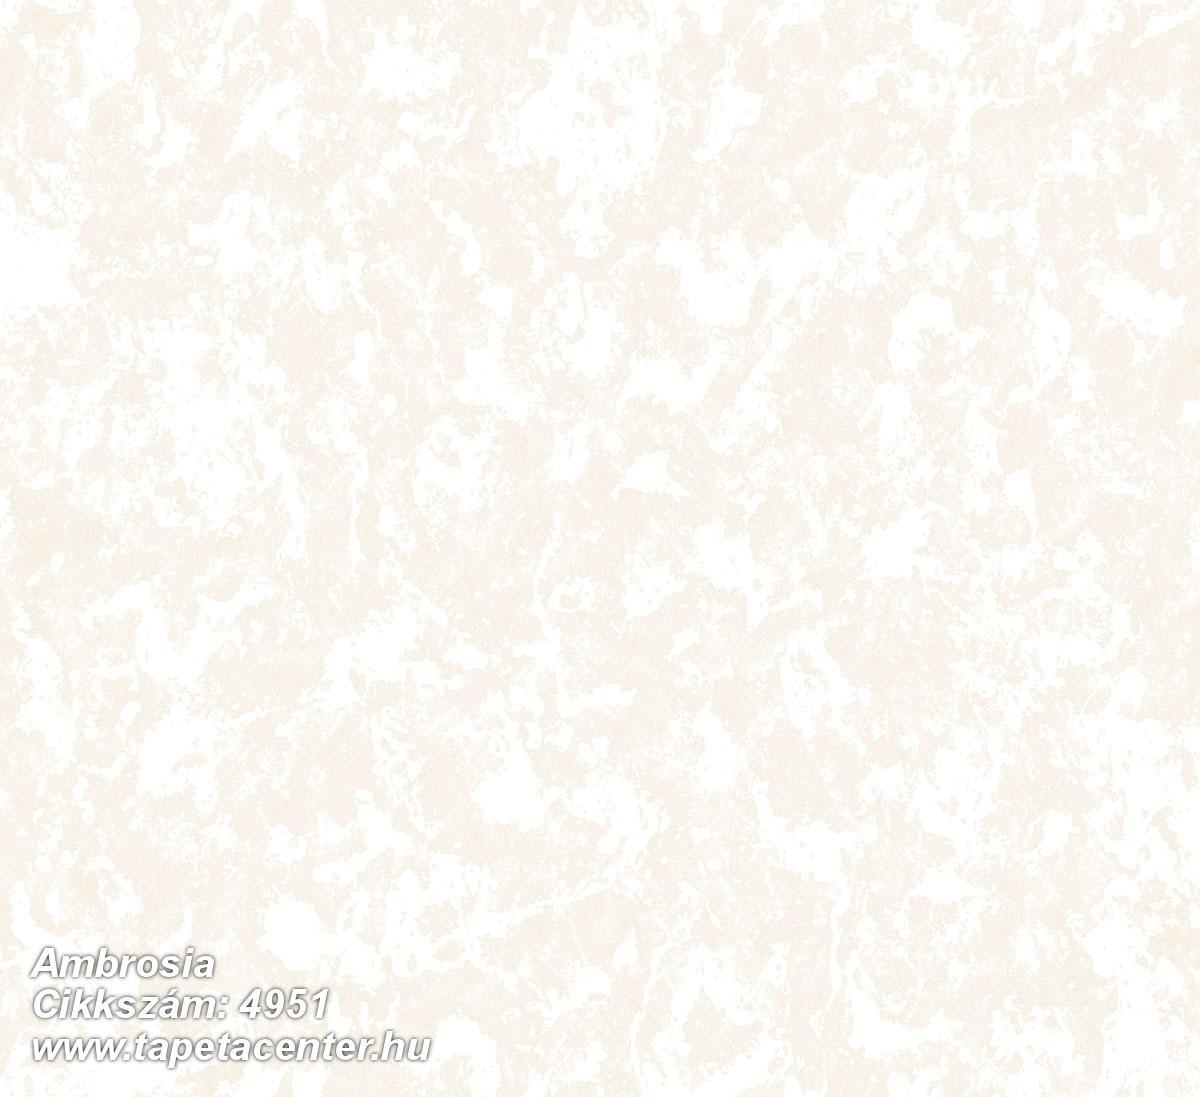 Barokk-klasszikus,bézs-drapp,fehér,súrolható,vlies tapéta